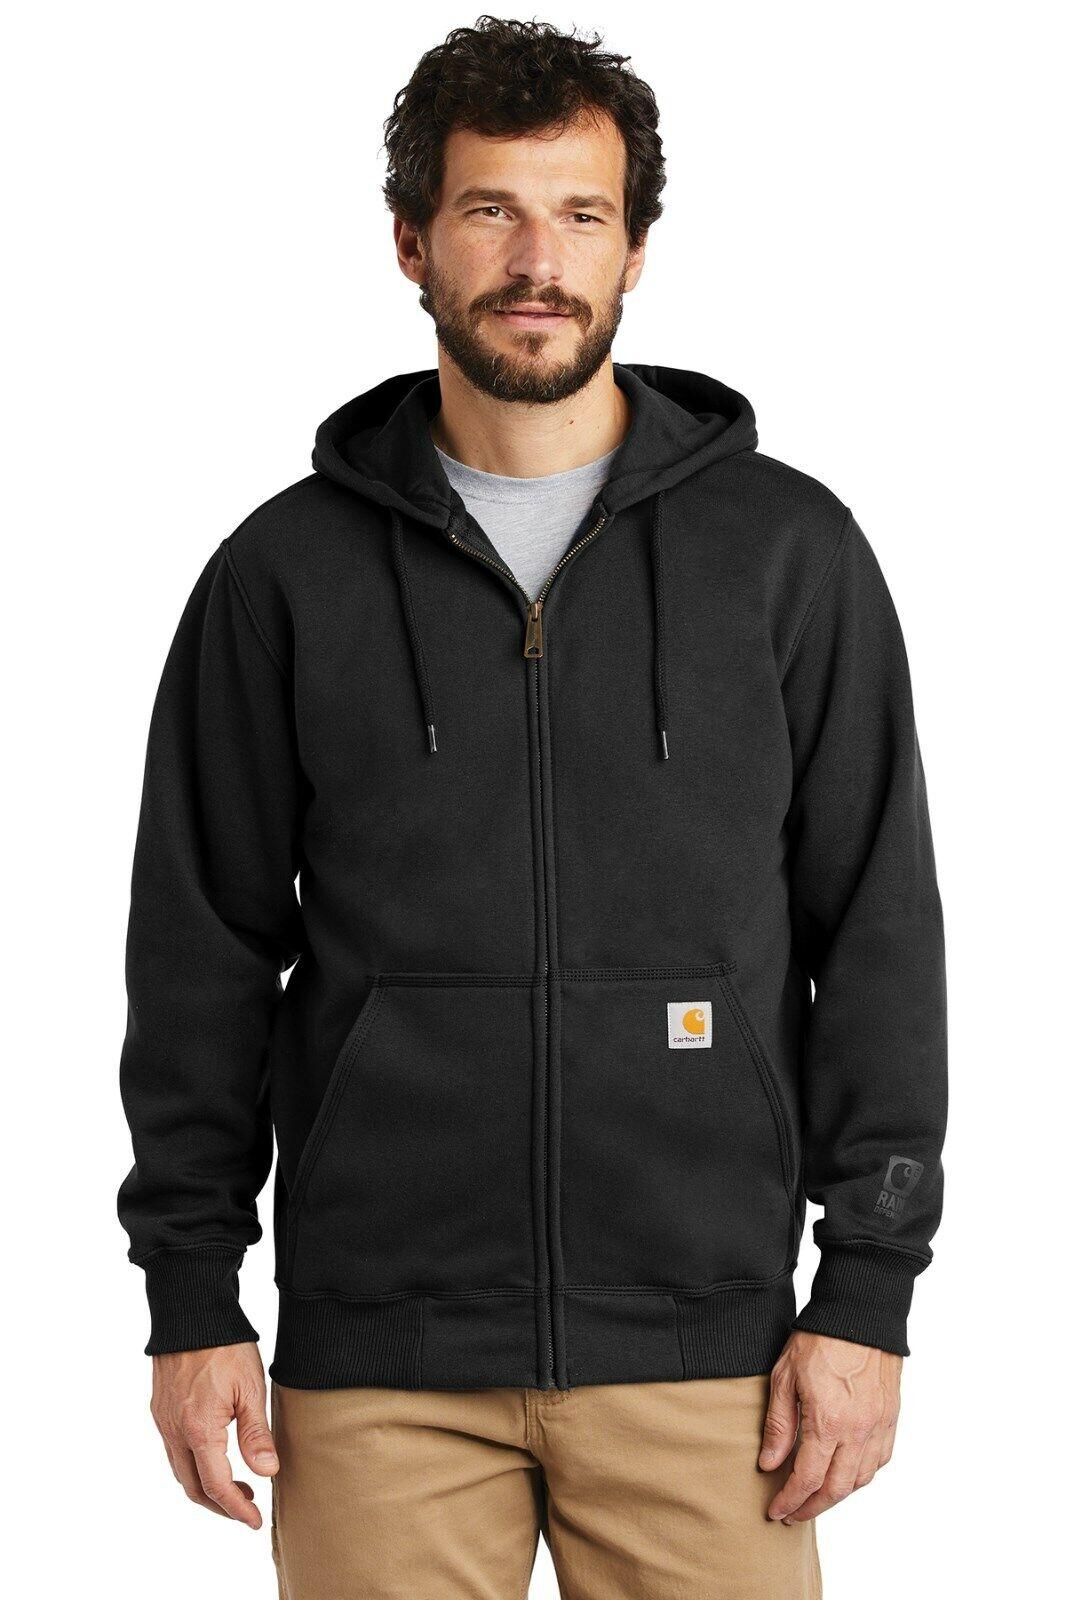 Carhartt Rain Defender Paxton Heavyweight Hooded Zip Front Sweatshirt